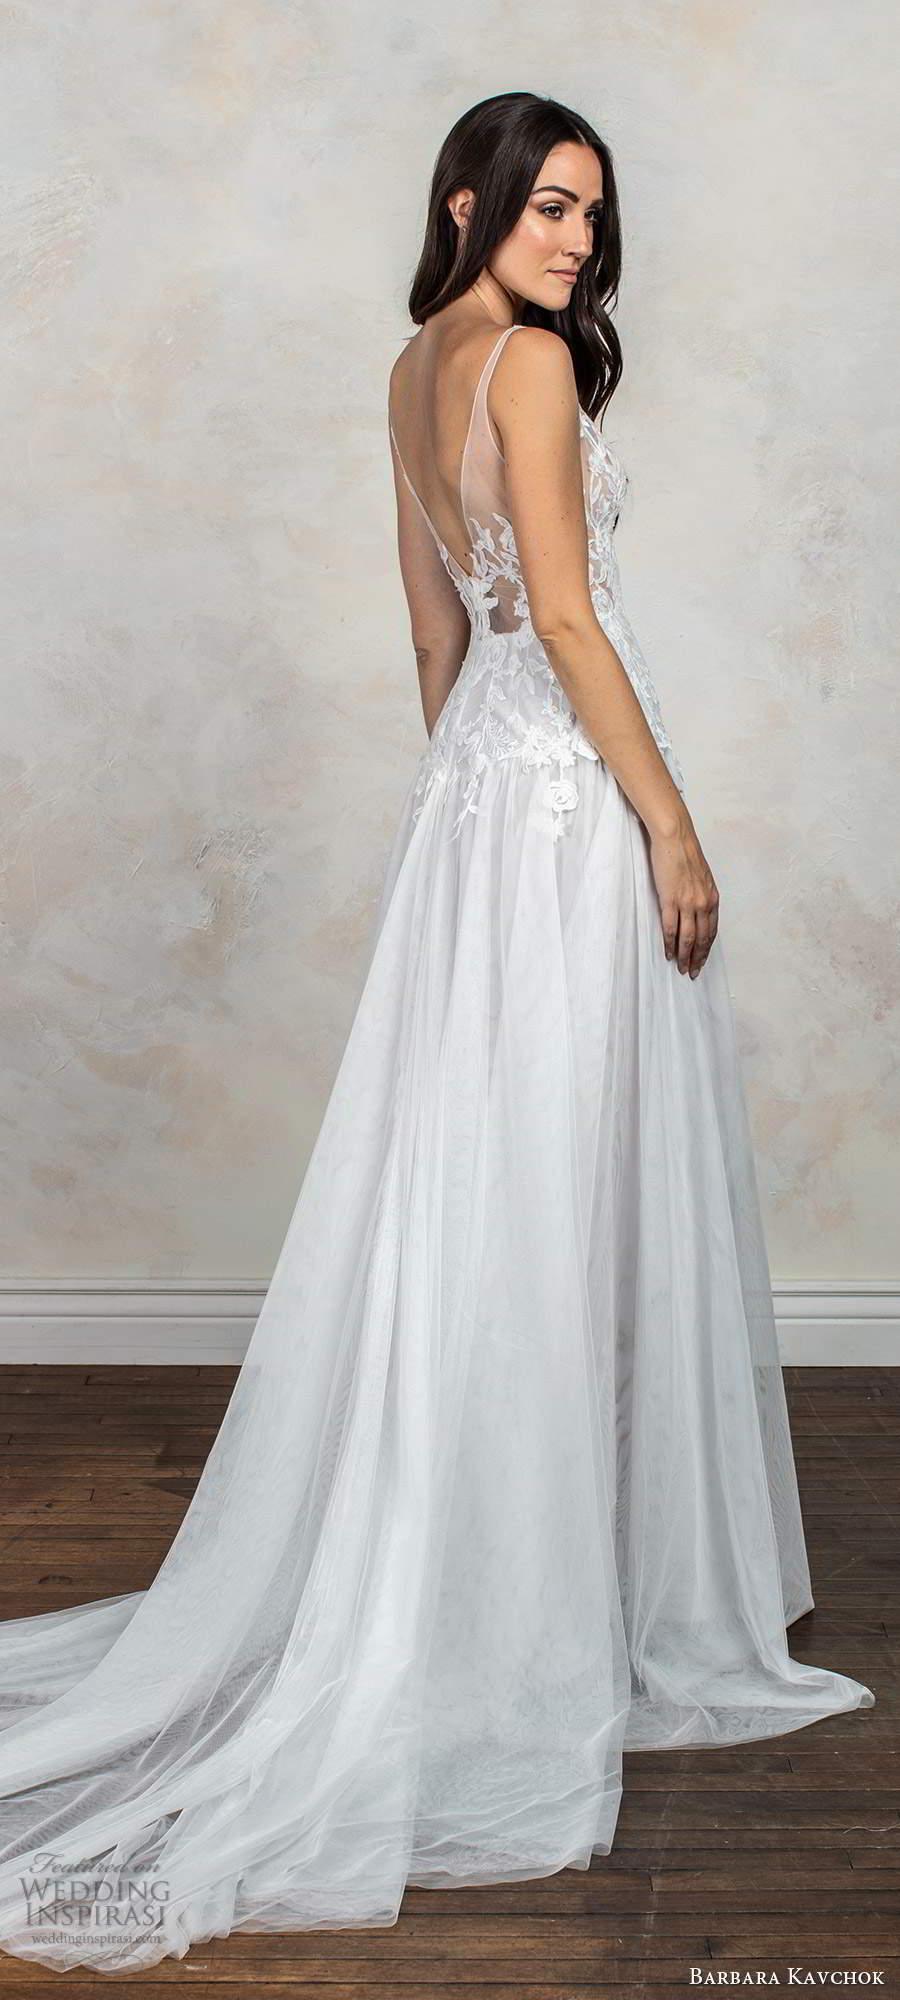 barbara kavchok fall 2020 bridal sleeveless illusion straps v neckline embellished sheer bodice a line ball gown wedding dress chapel train (6) bv